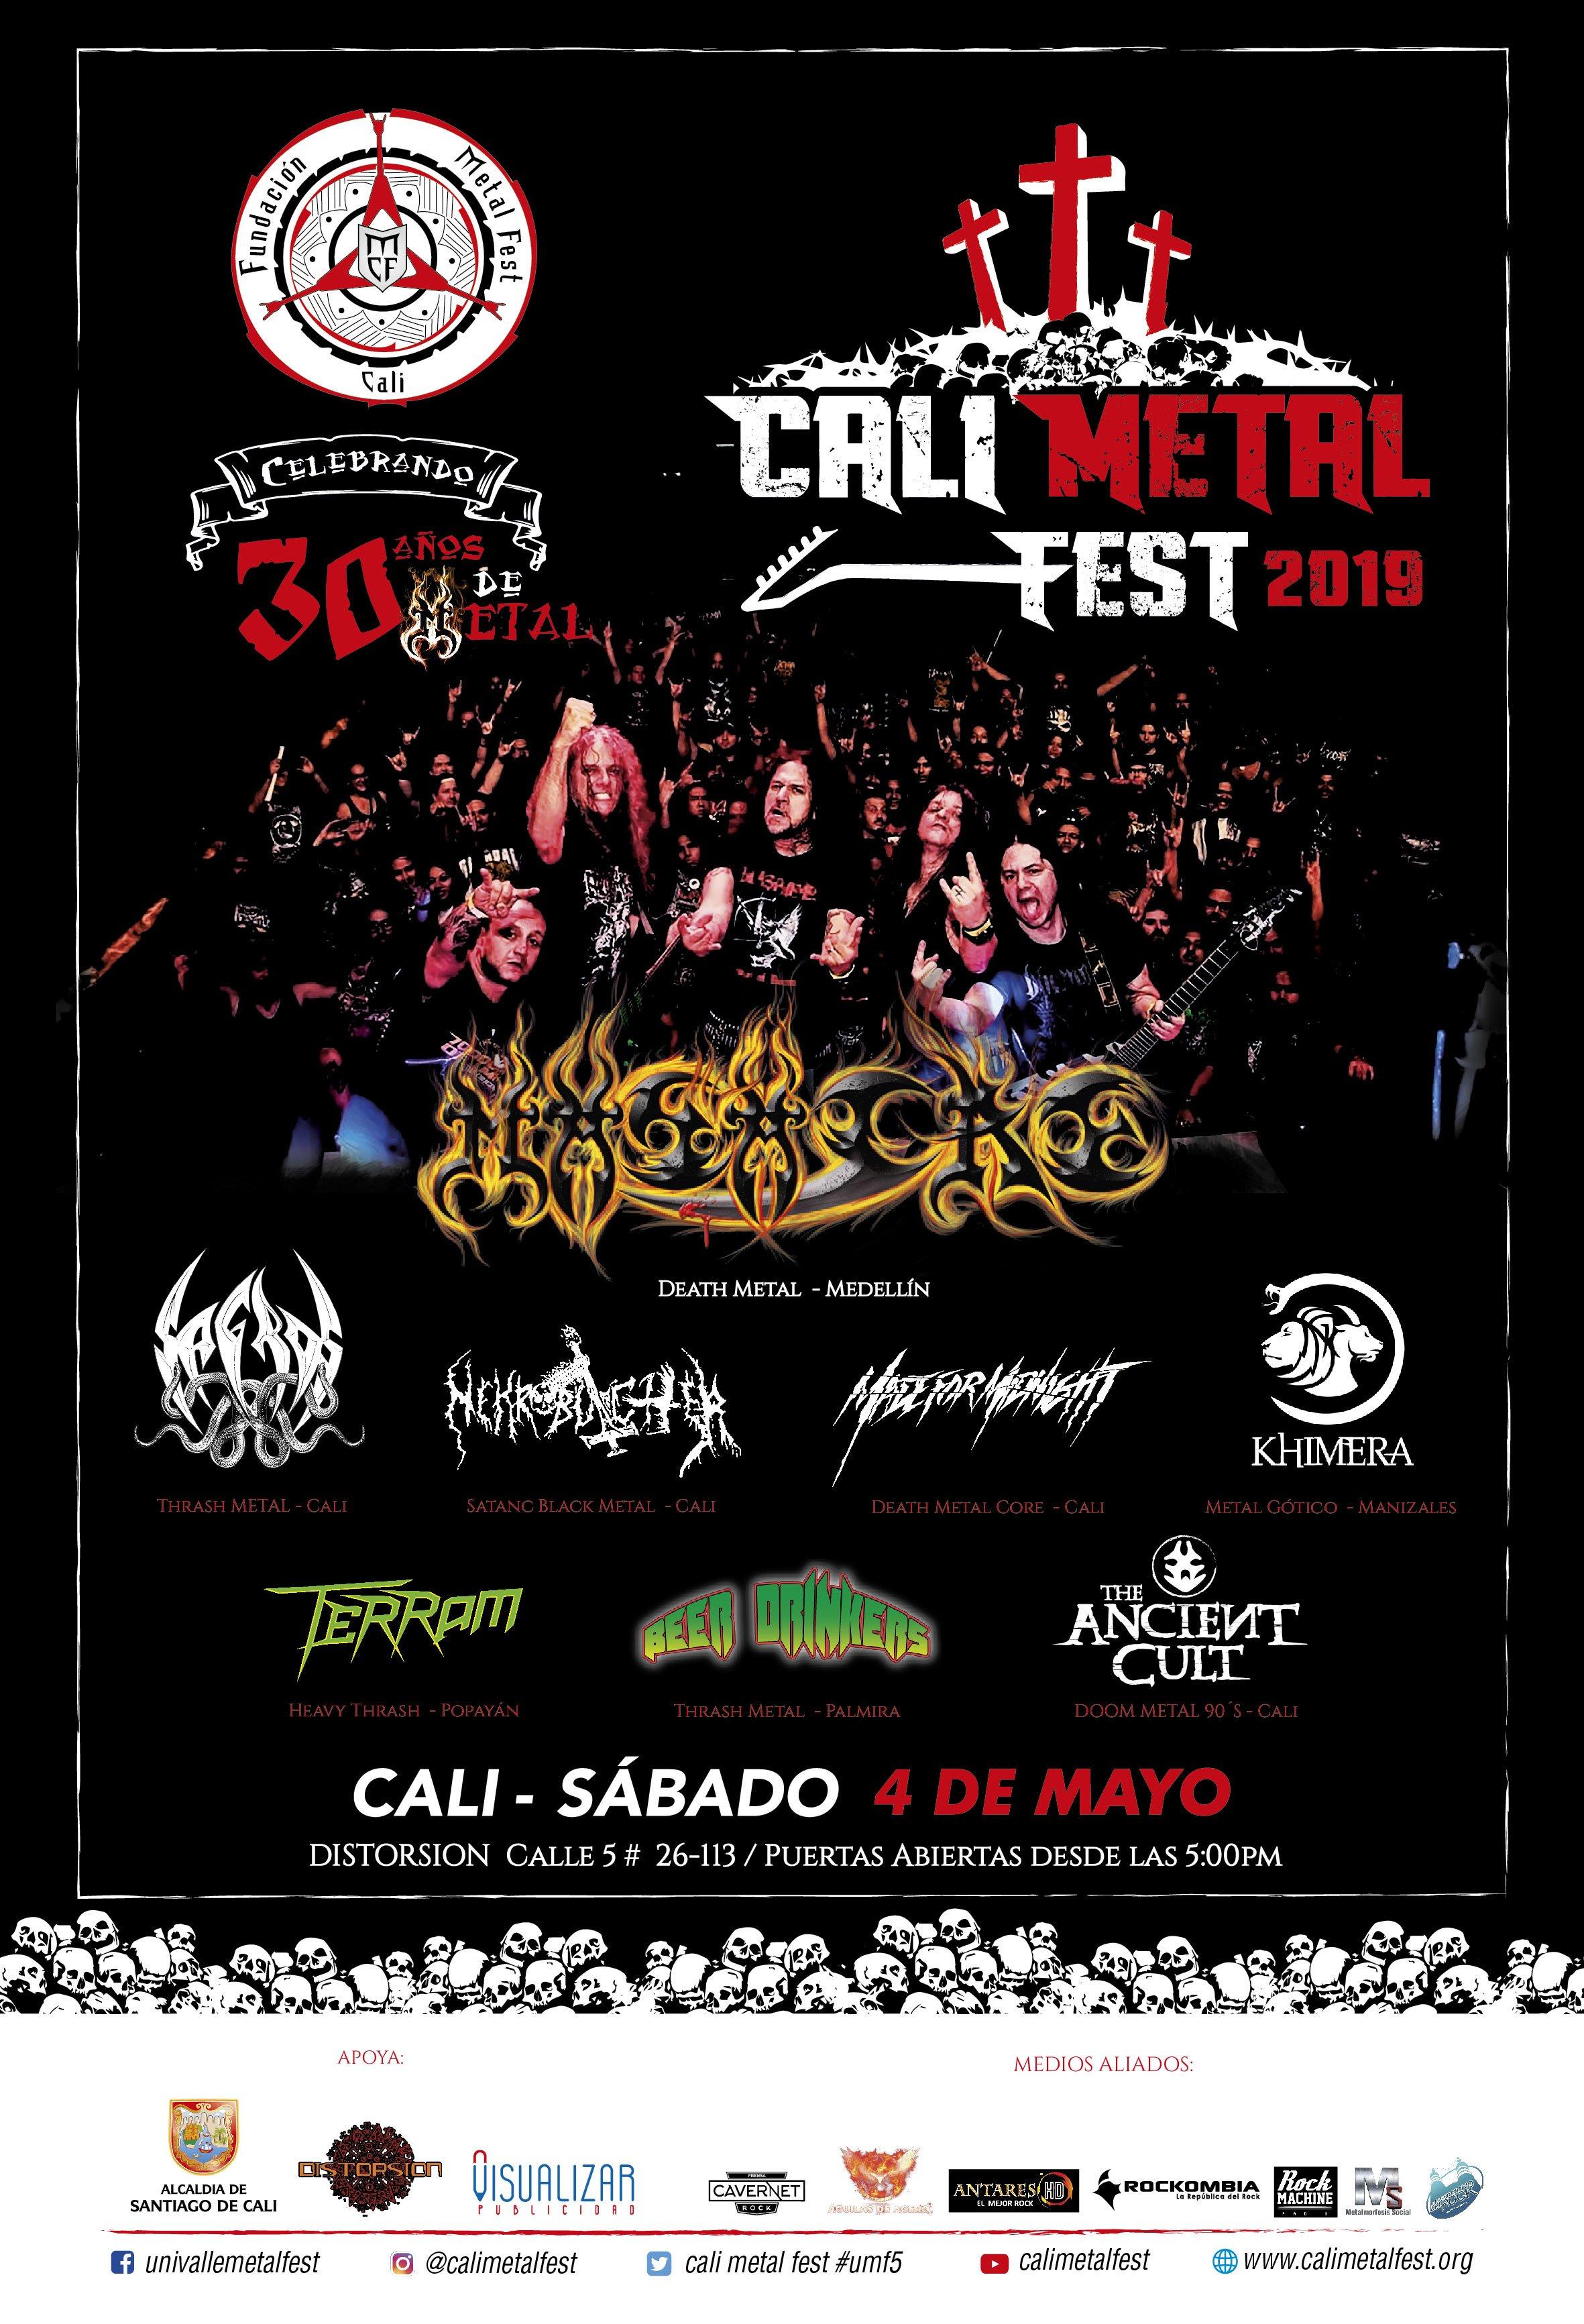 Cali Metal Fest 2019 - Afiche-Festival-Cali-Metal-Fest-01-1